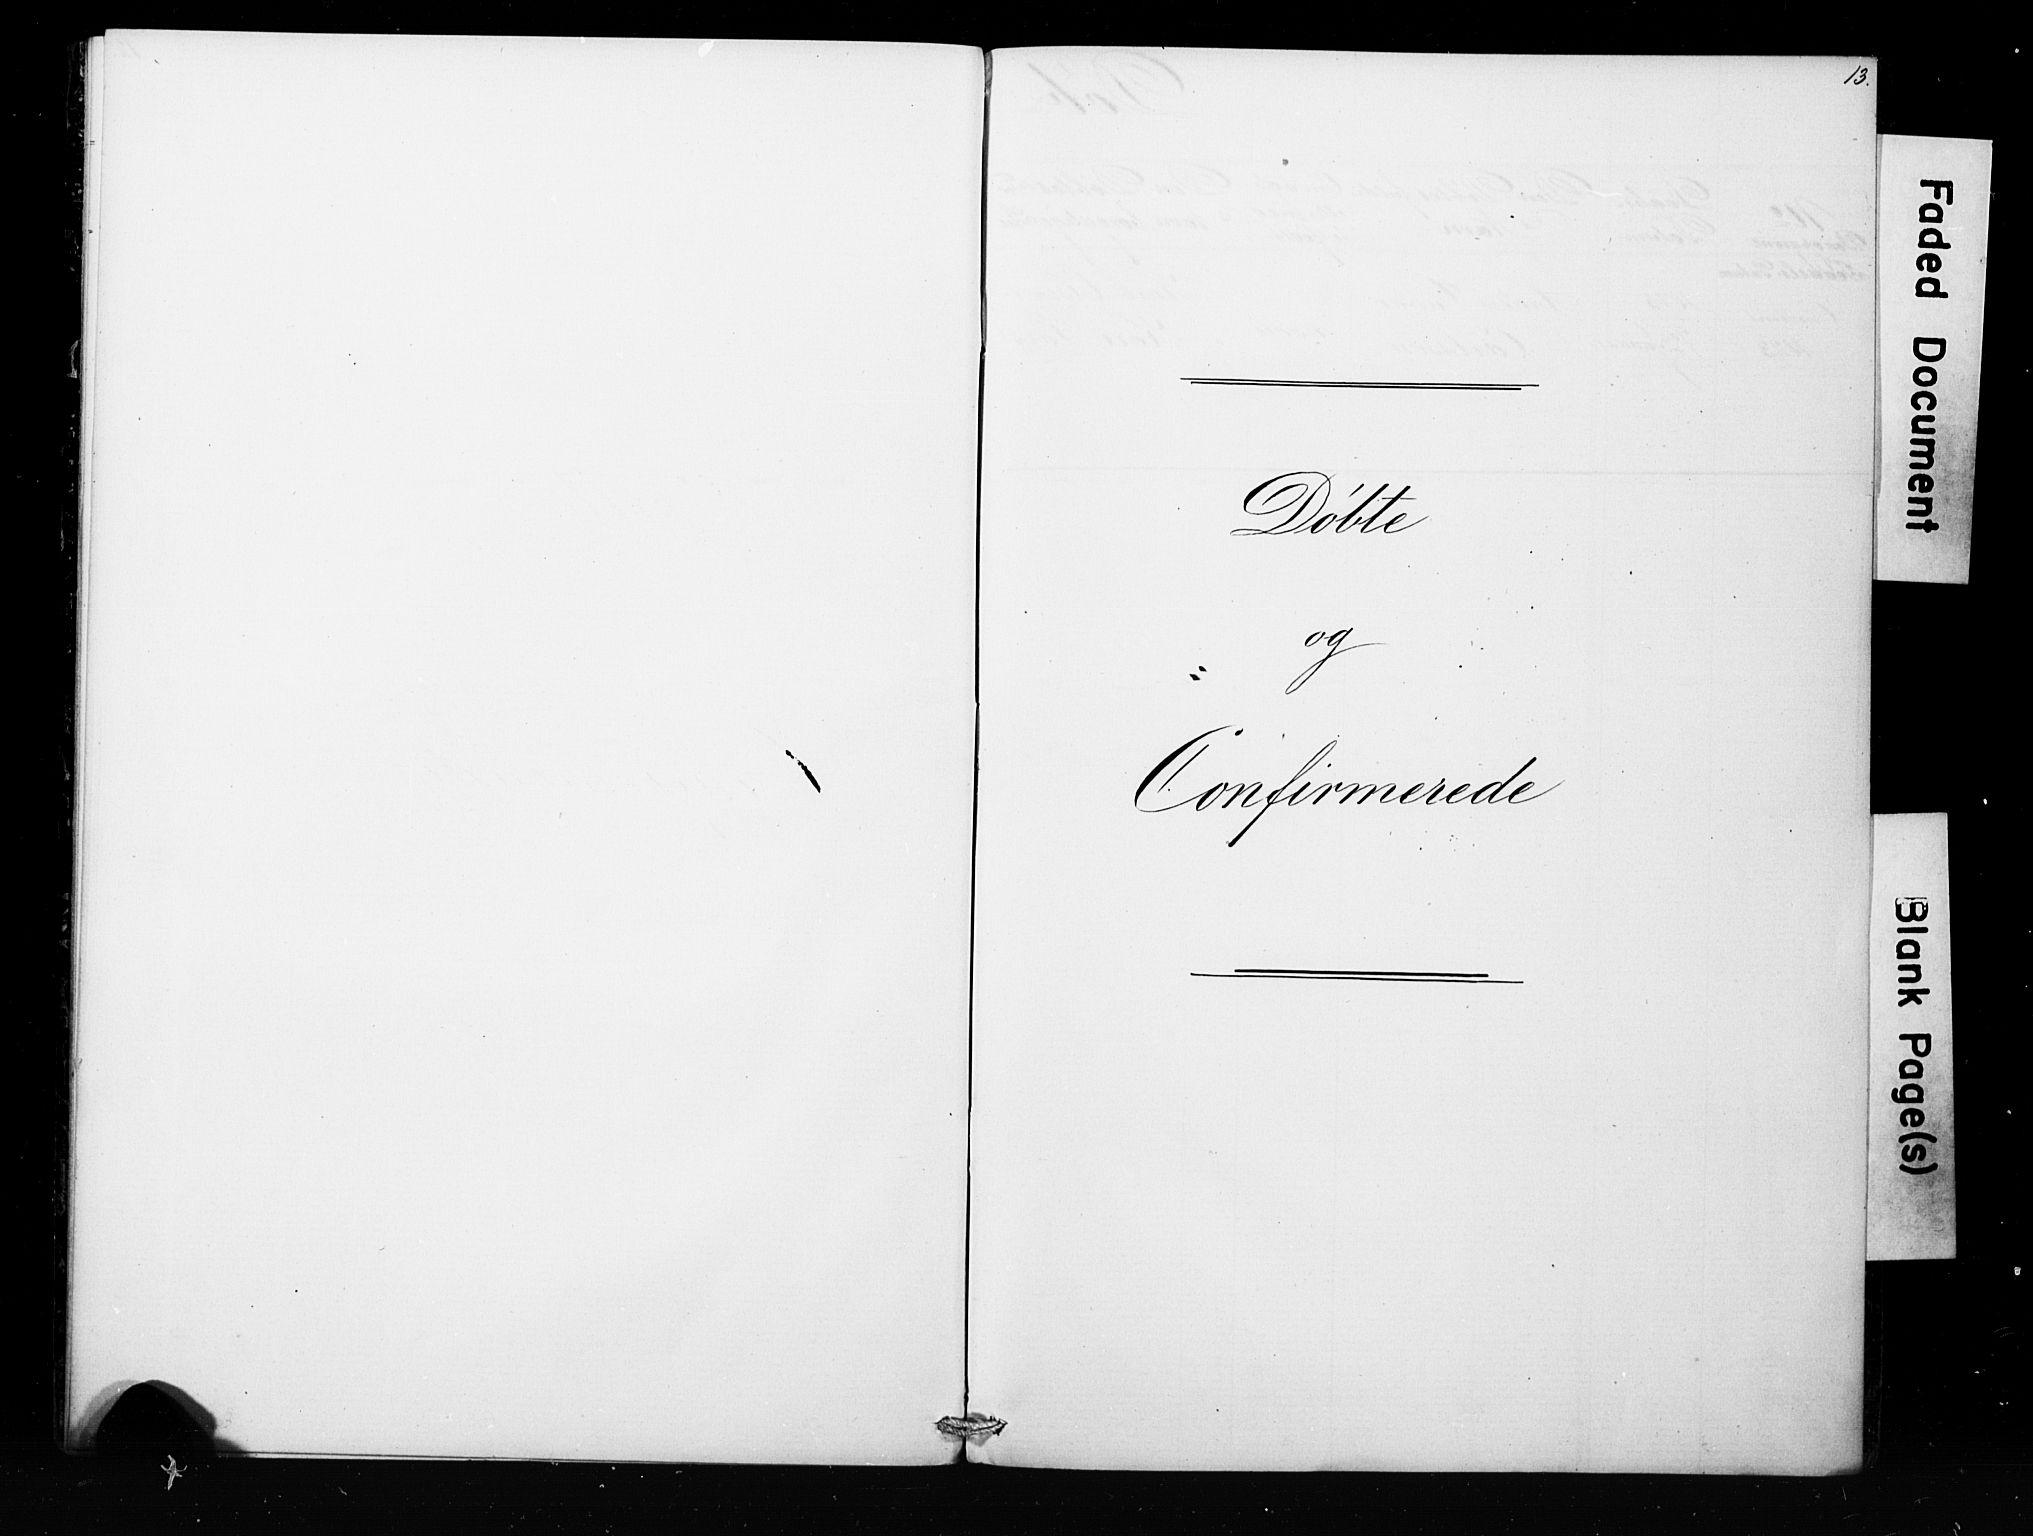 SAB, Bergens strafanstalts sokneprestembete*, Klokkerbok nr. A 1, 1874-1884, s. 13